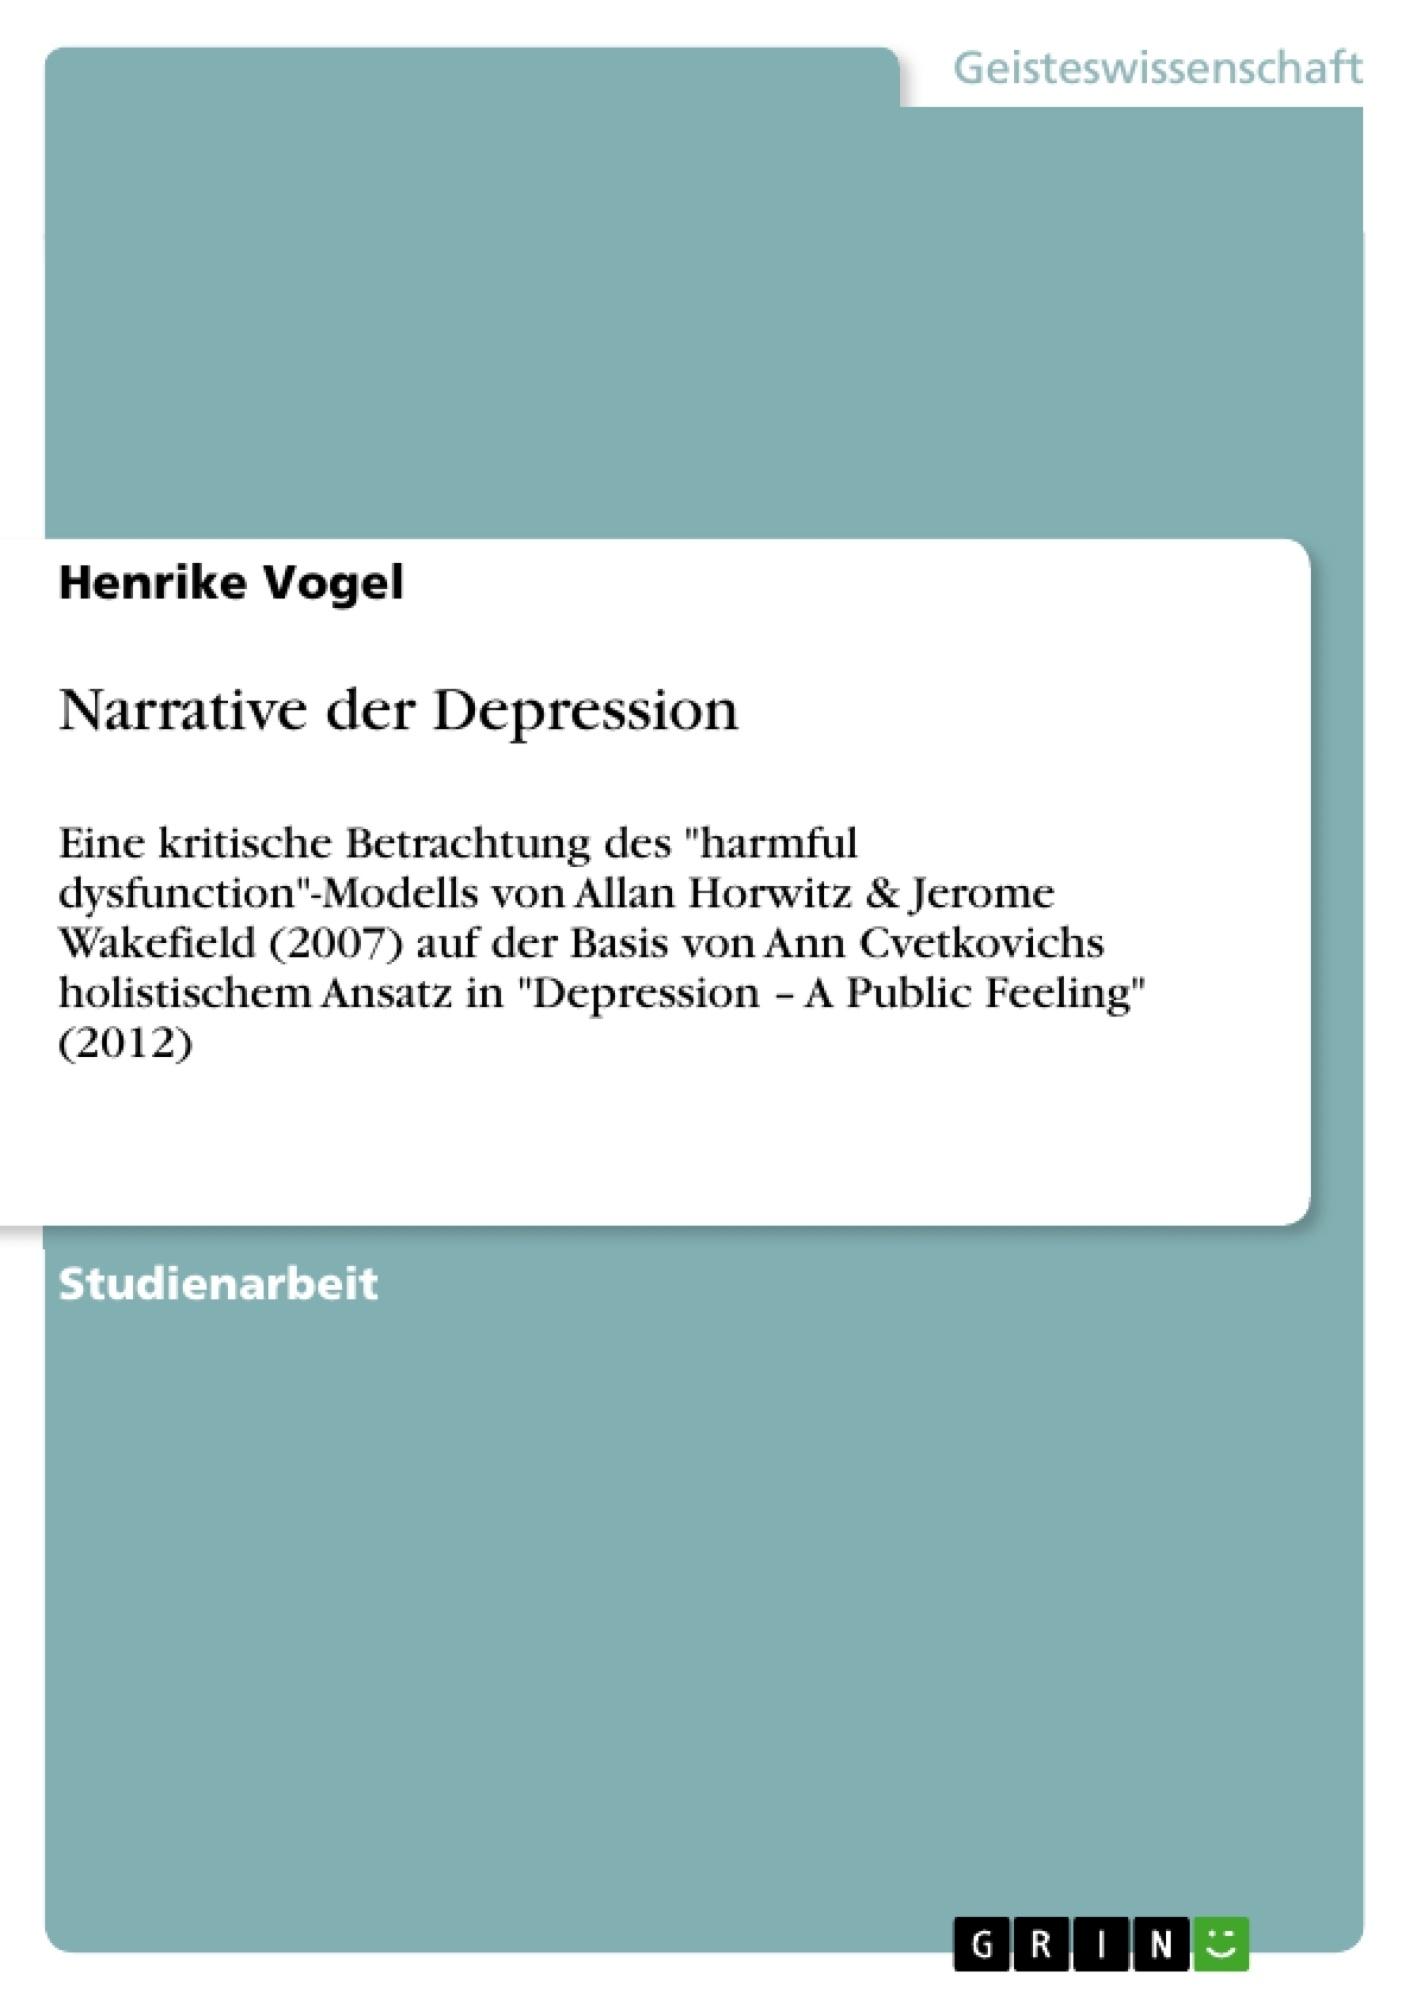 Titel: Narrative der Depression